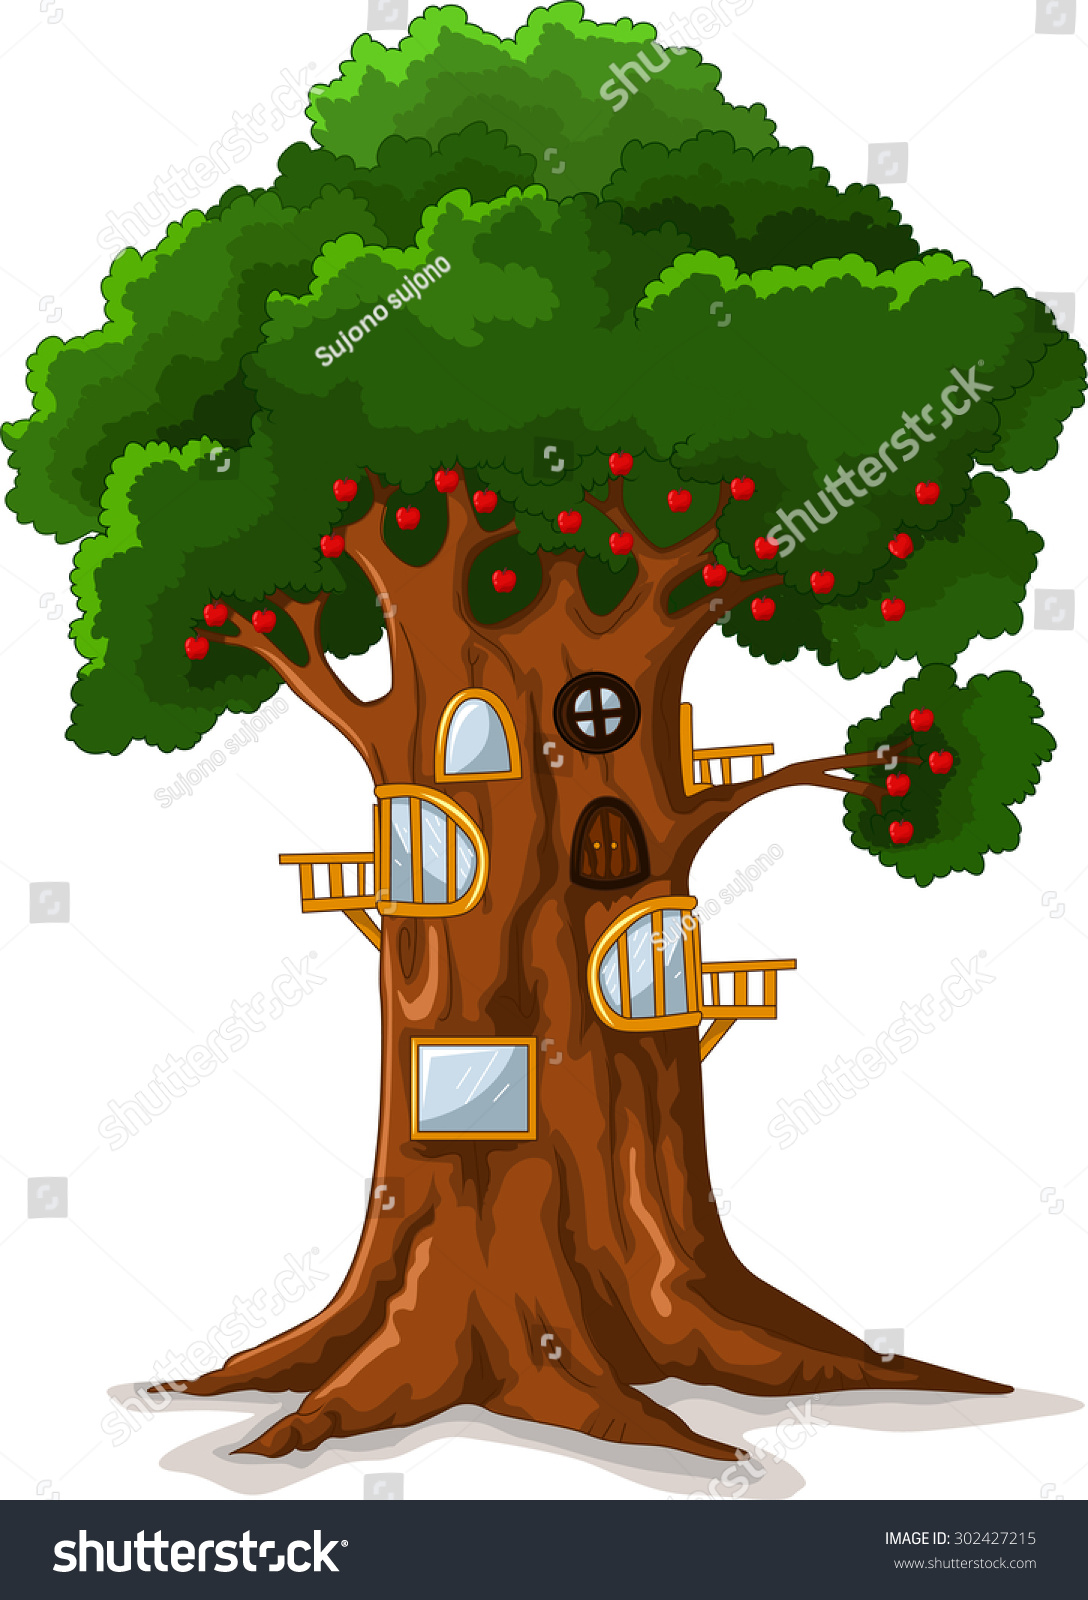 Apple Tree House Cartoon Stock Vector 302427215 Shutterstock